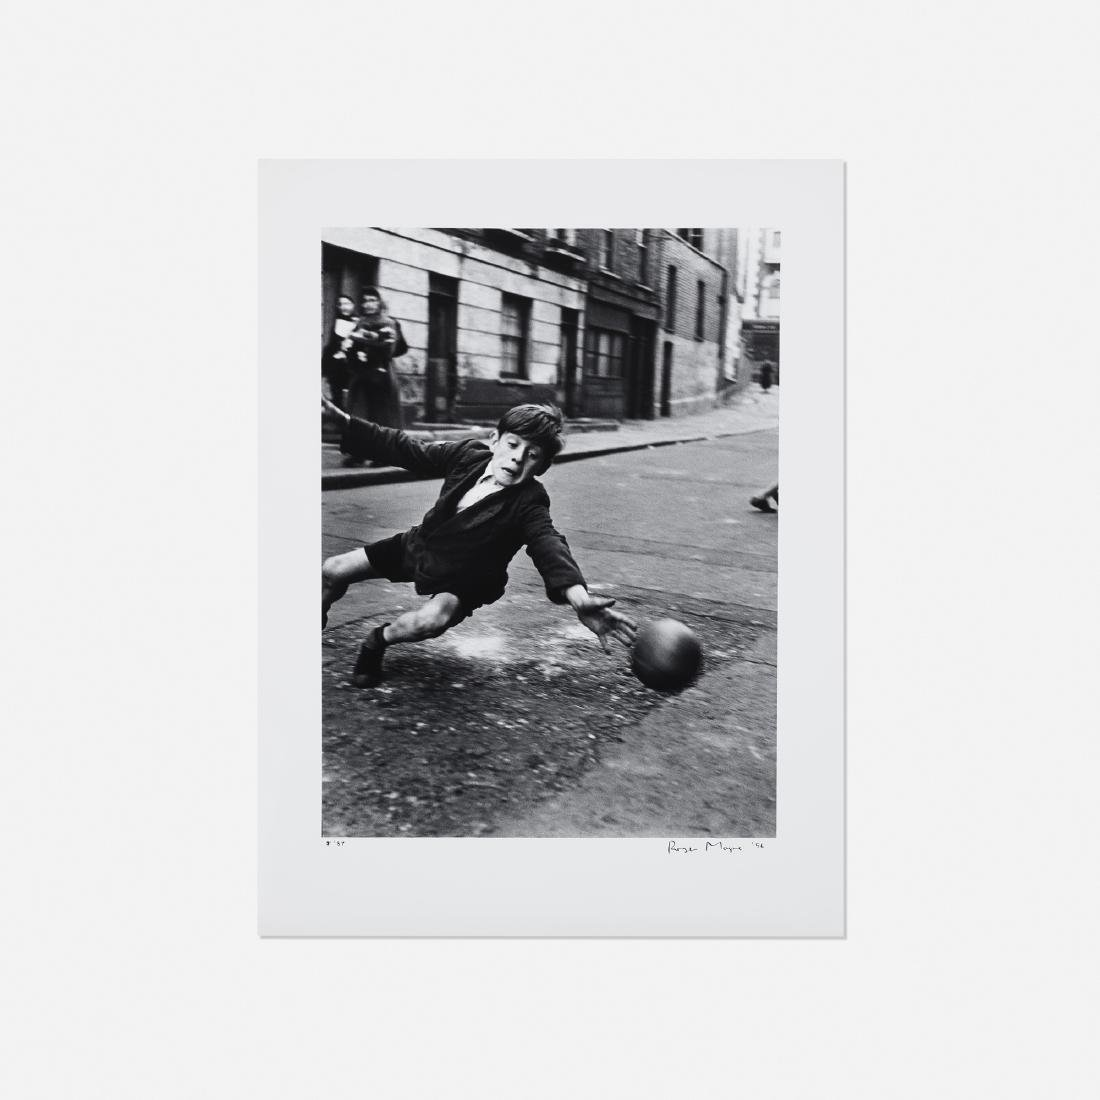 Roger Mayne, Goalie, Street Football, Brindley Rd.